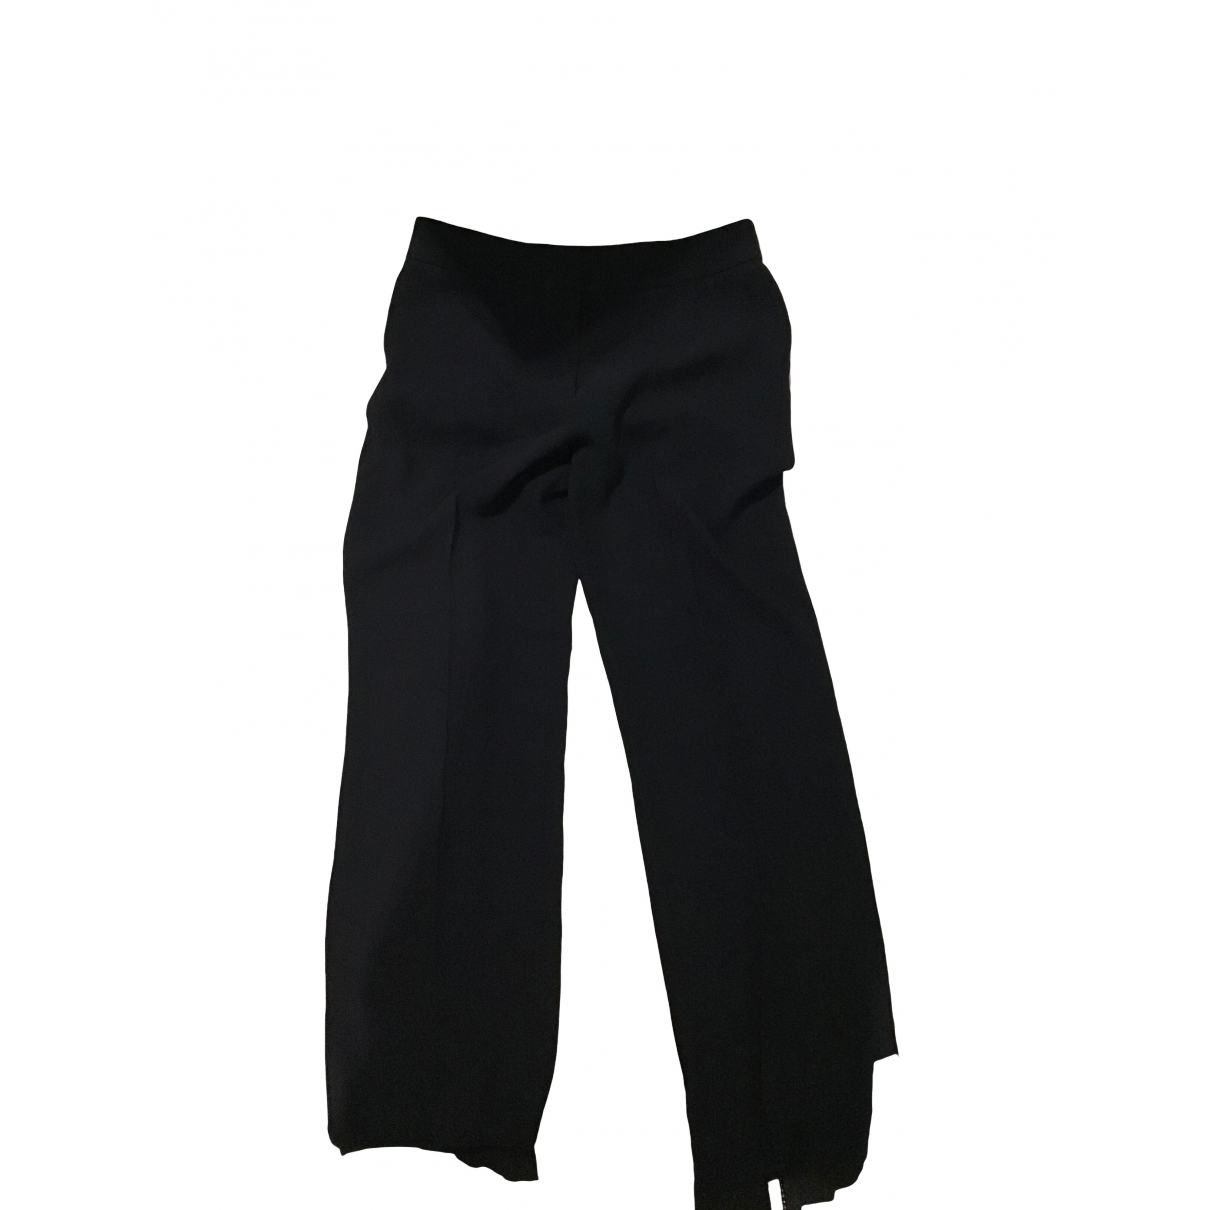 Hobbs \N Black Trousers for Women 12 UK